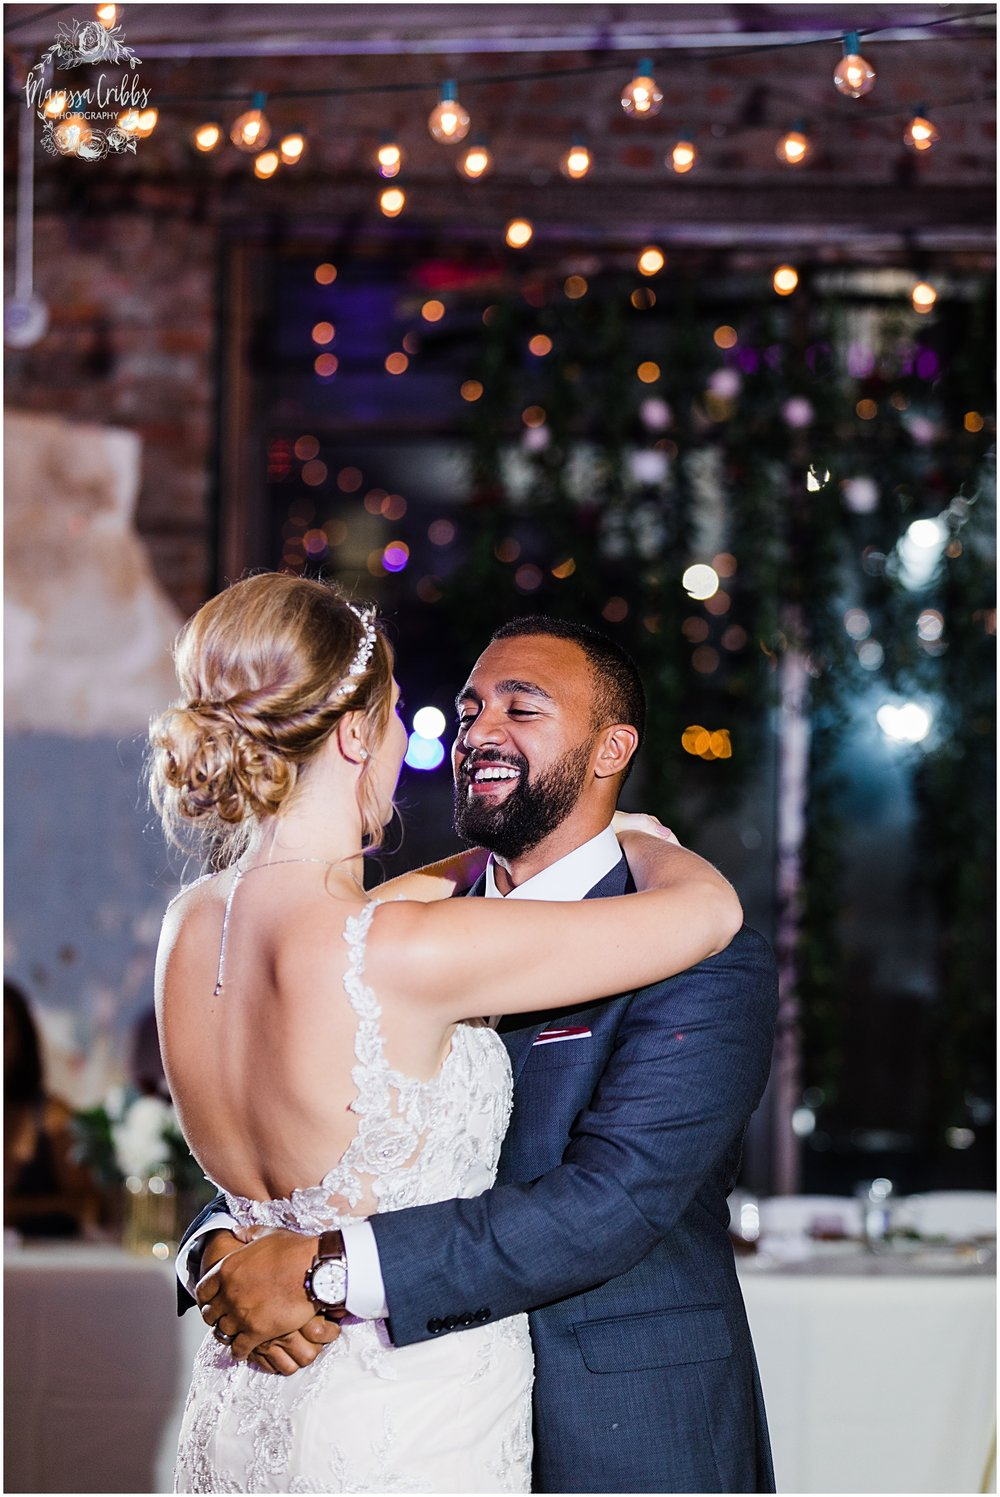 BAUER WEDDING   KELSEA & JUSTIN   MARISSA CRIBBS PHOTOGRAPHY_6595.jpg